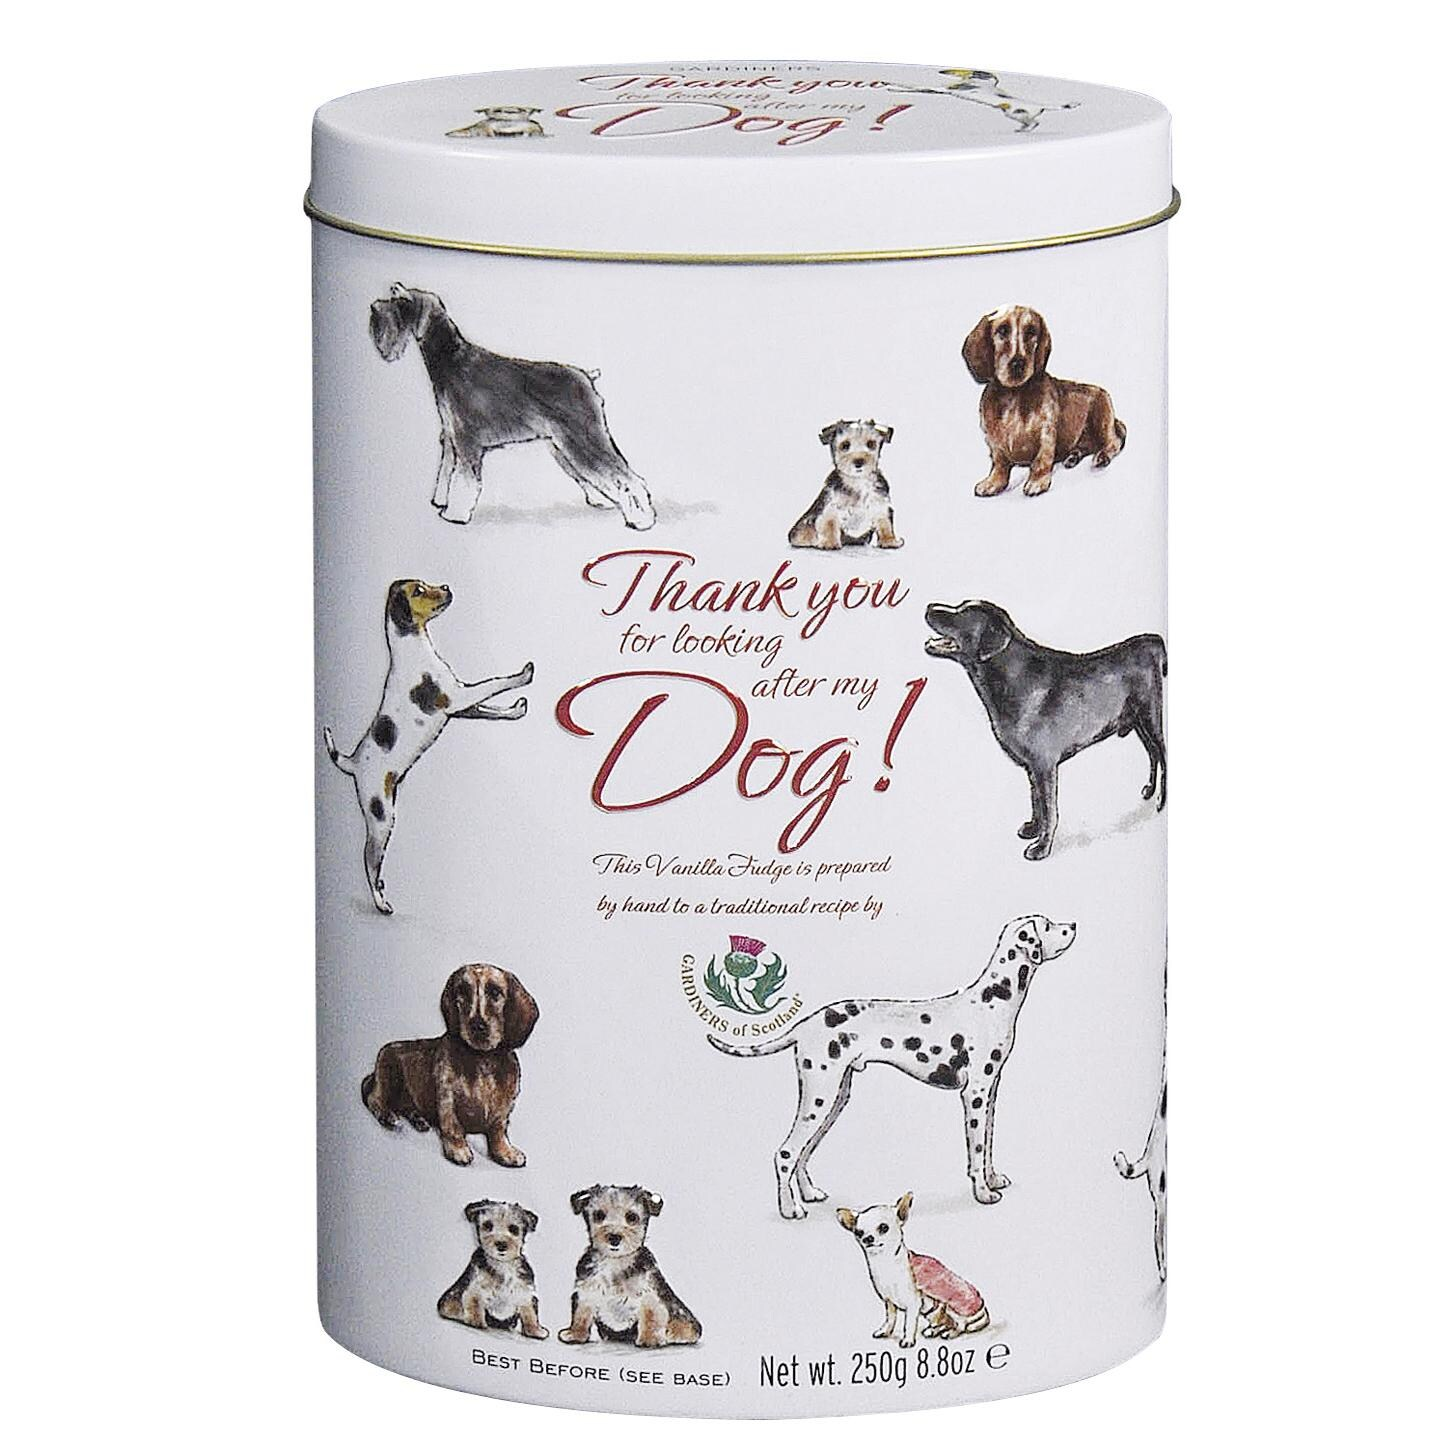 Gardiners Fudge Thank you - Dog 250g - Weichkaramellen